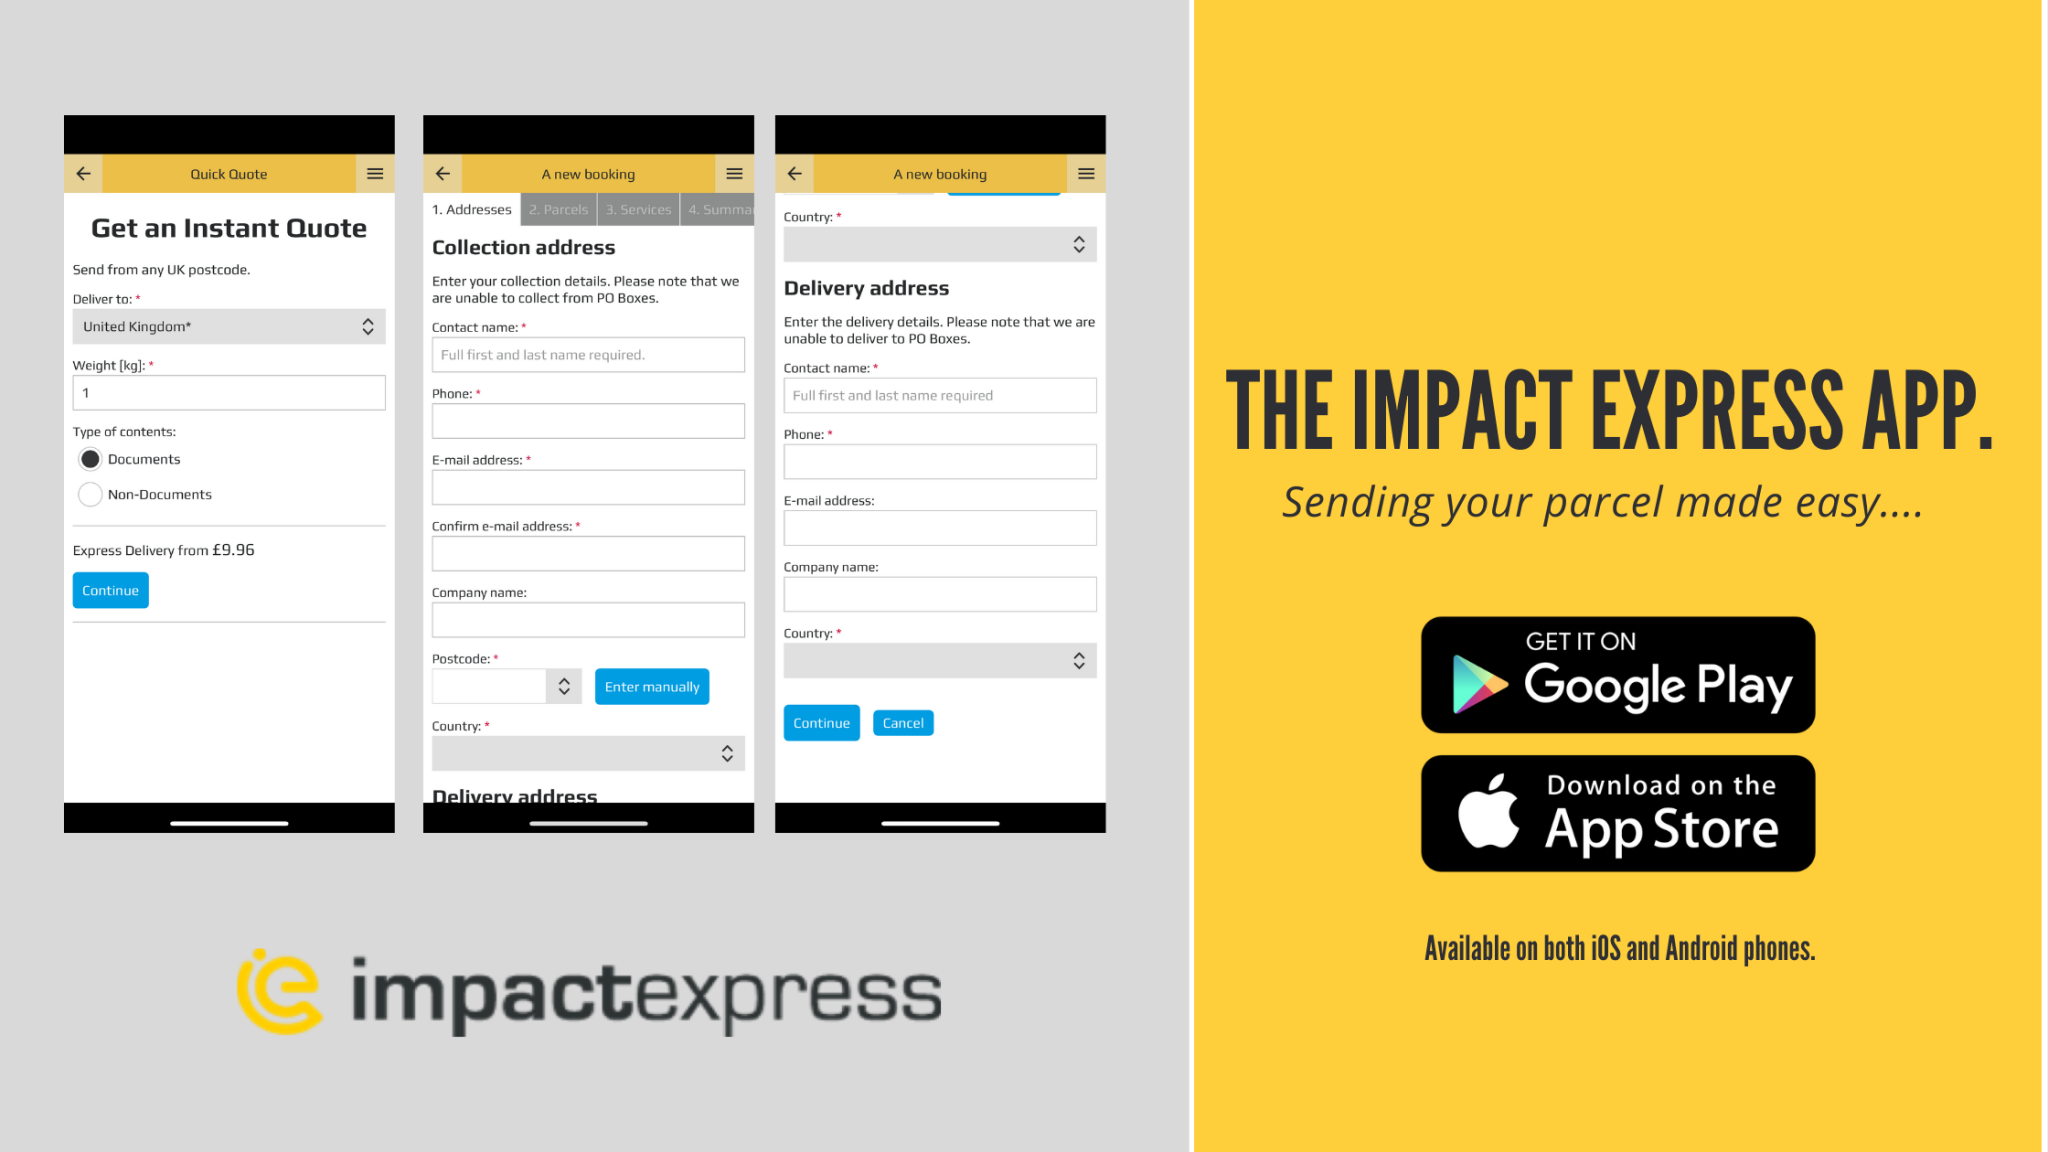 ImpactExpress app screenshots